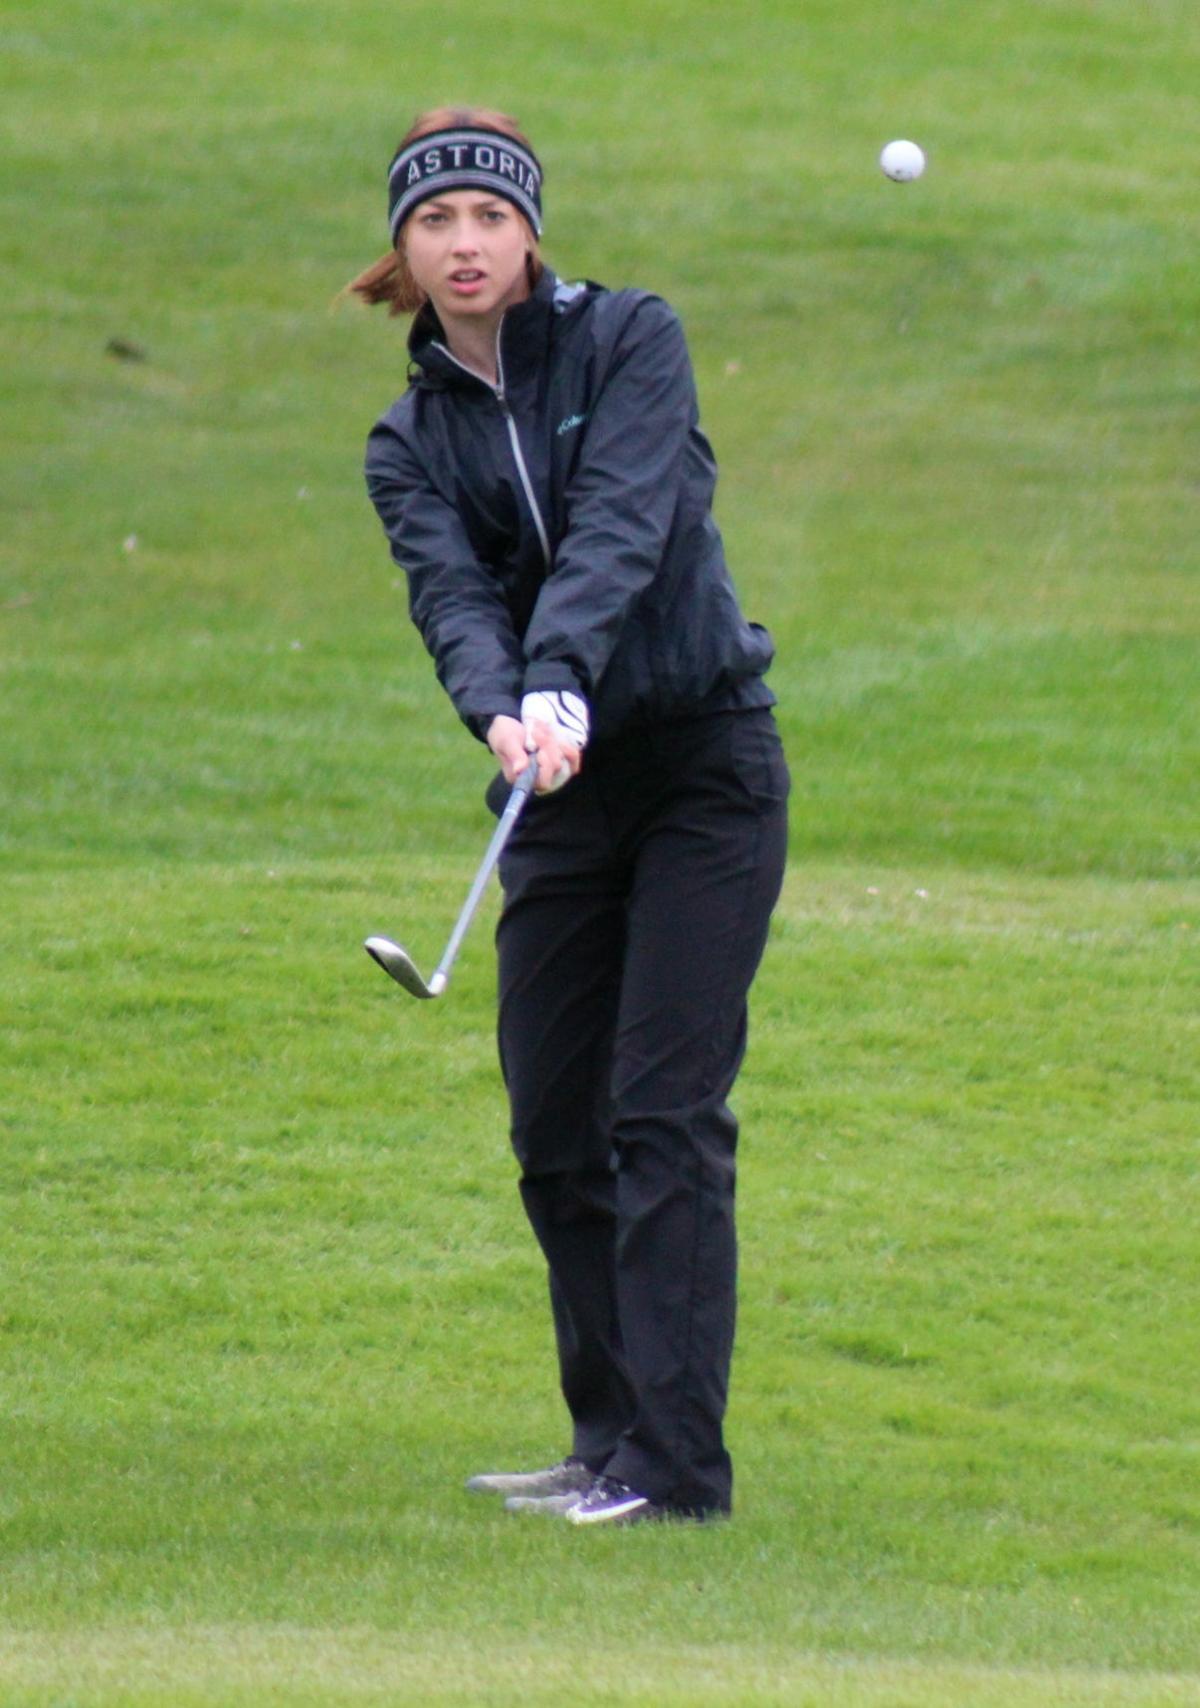 Astoria golfer Samantha Hemsley